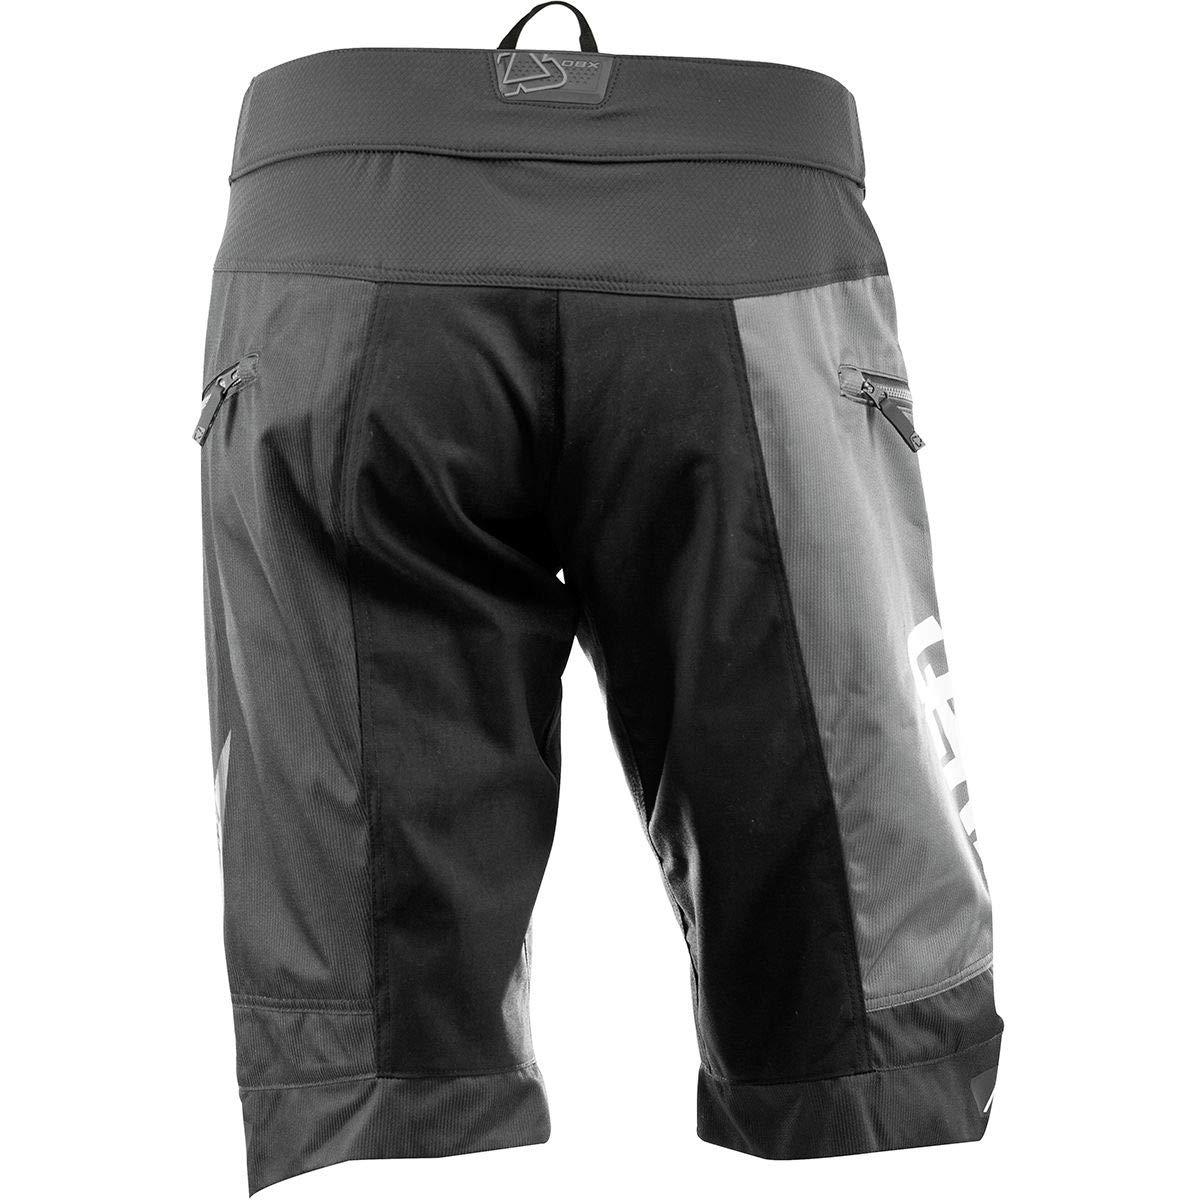 Leatt DBX 4.0 Adult Off-Road BMX Cycling Shorts